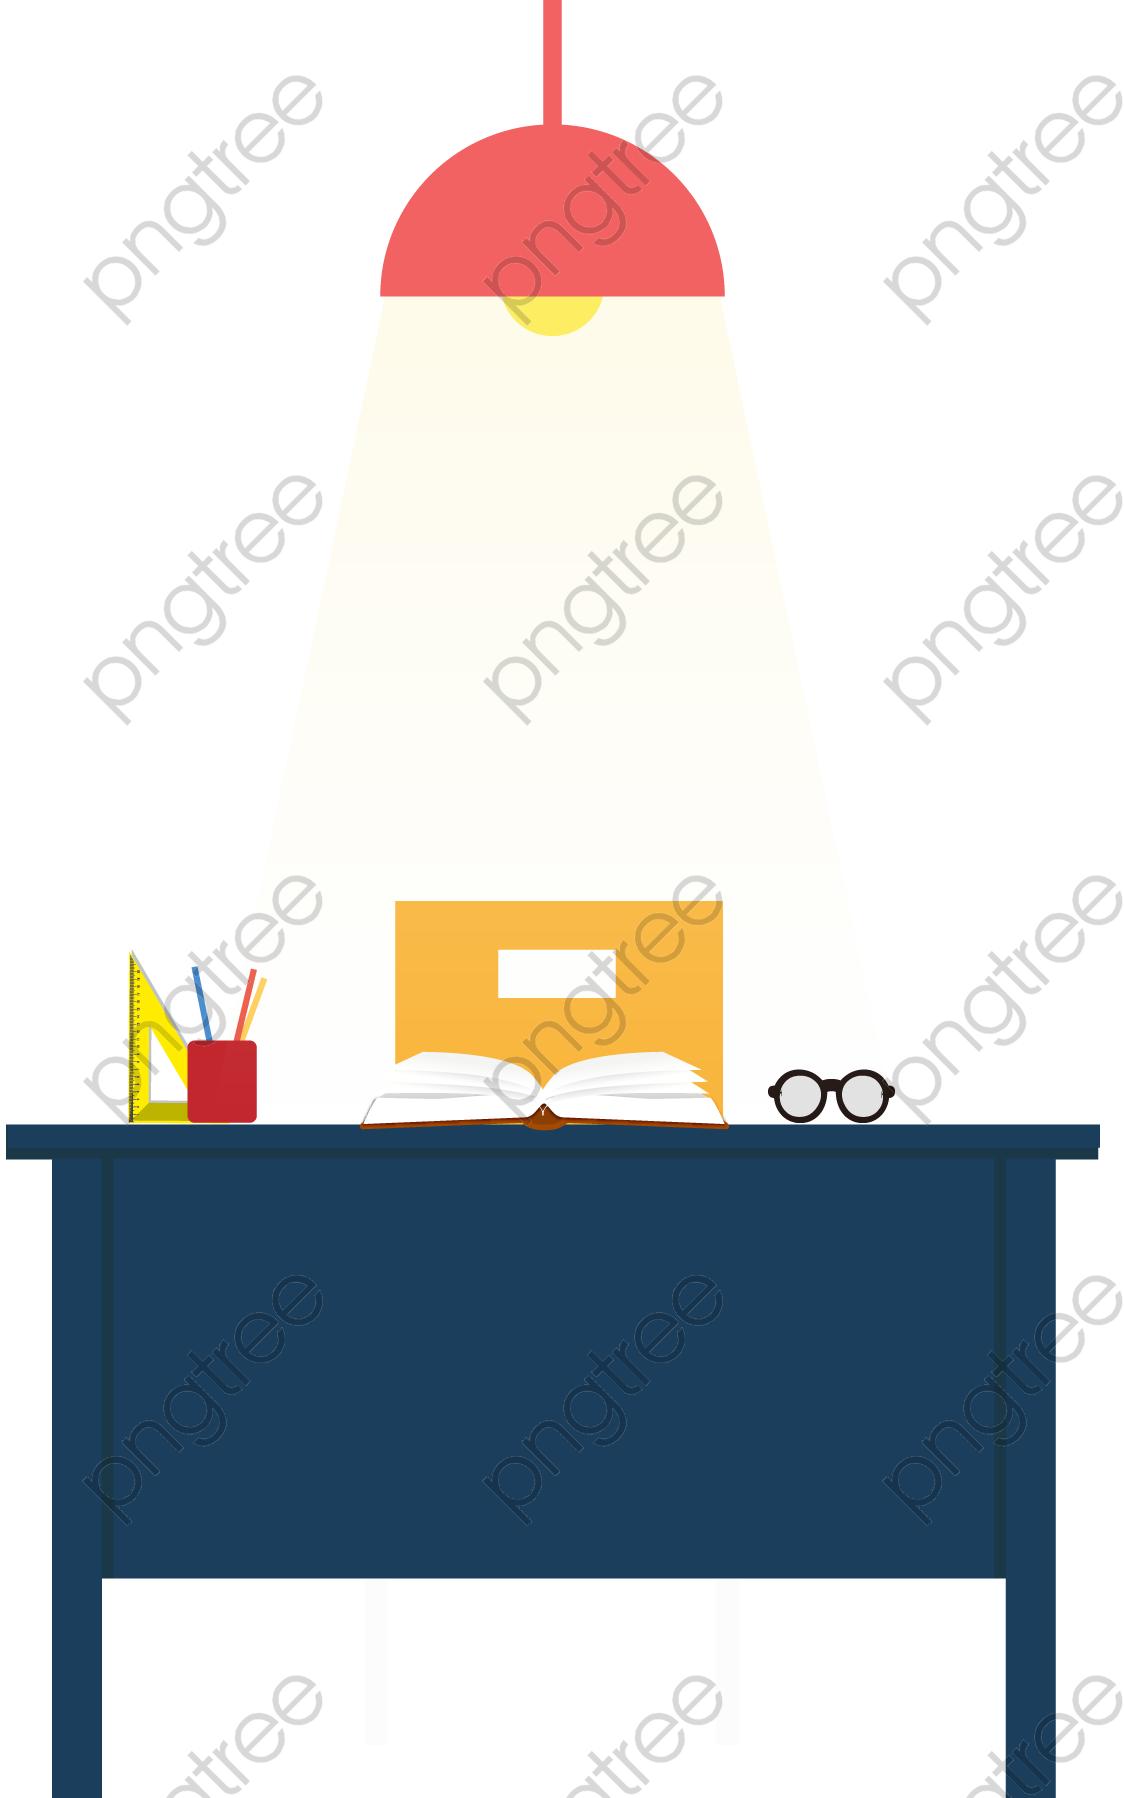 Transparent flat teacher desk PNG Format Image With Size 1124*1798.